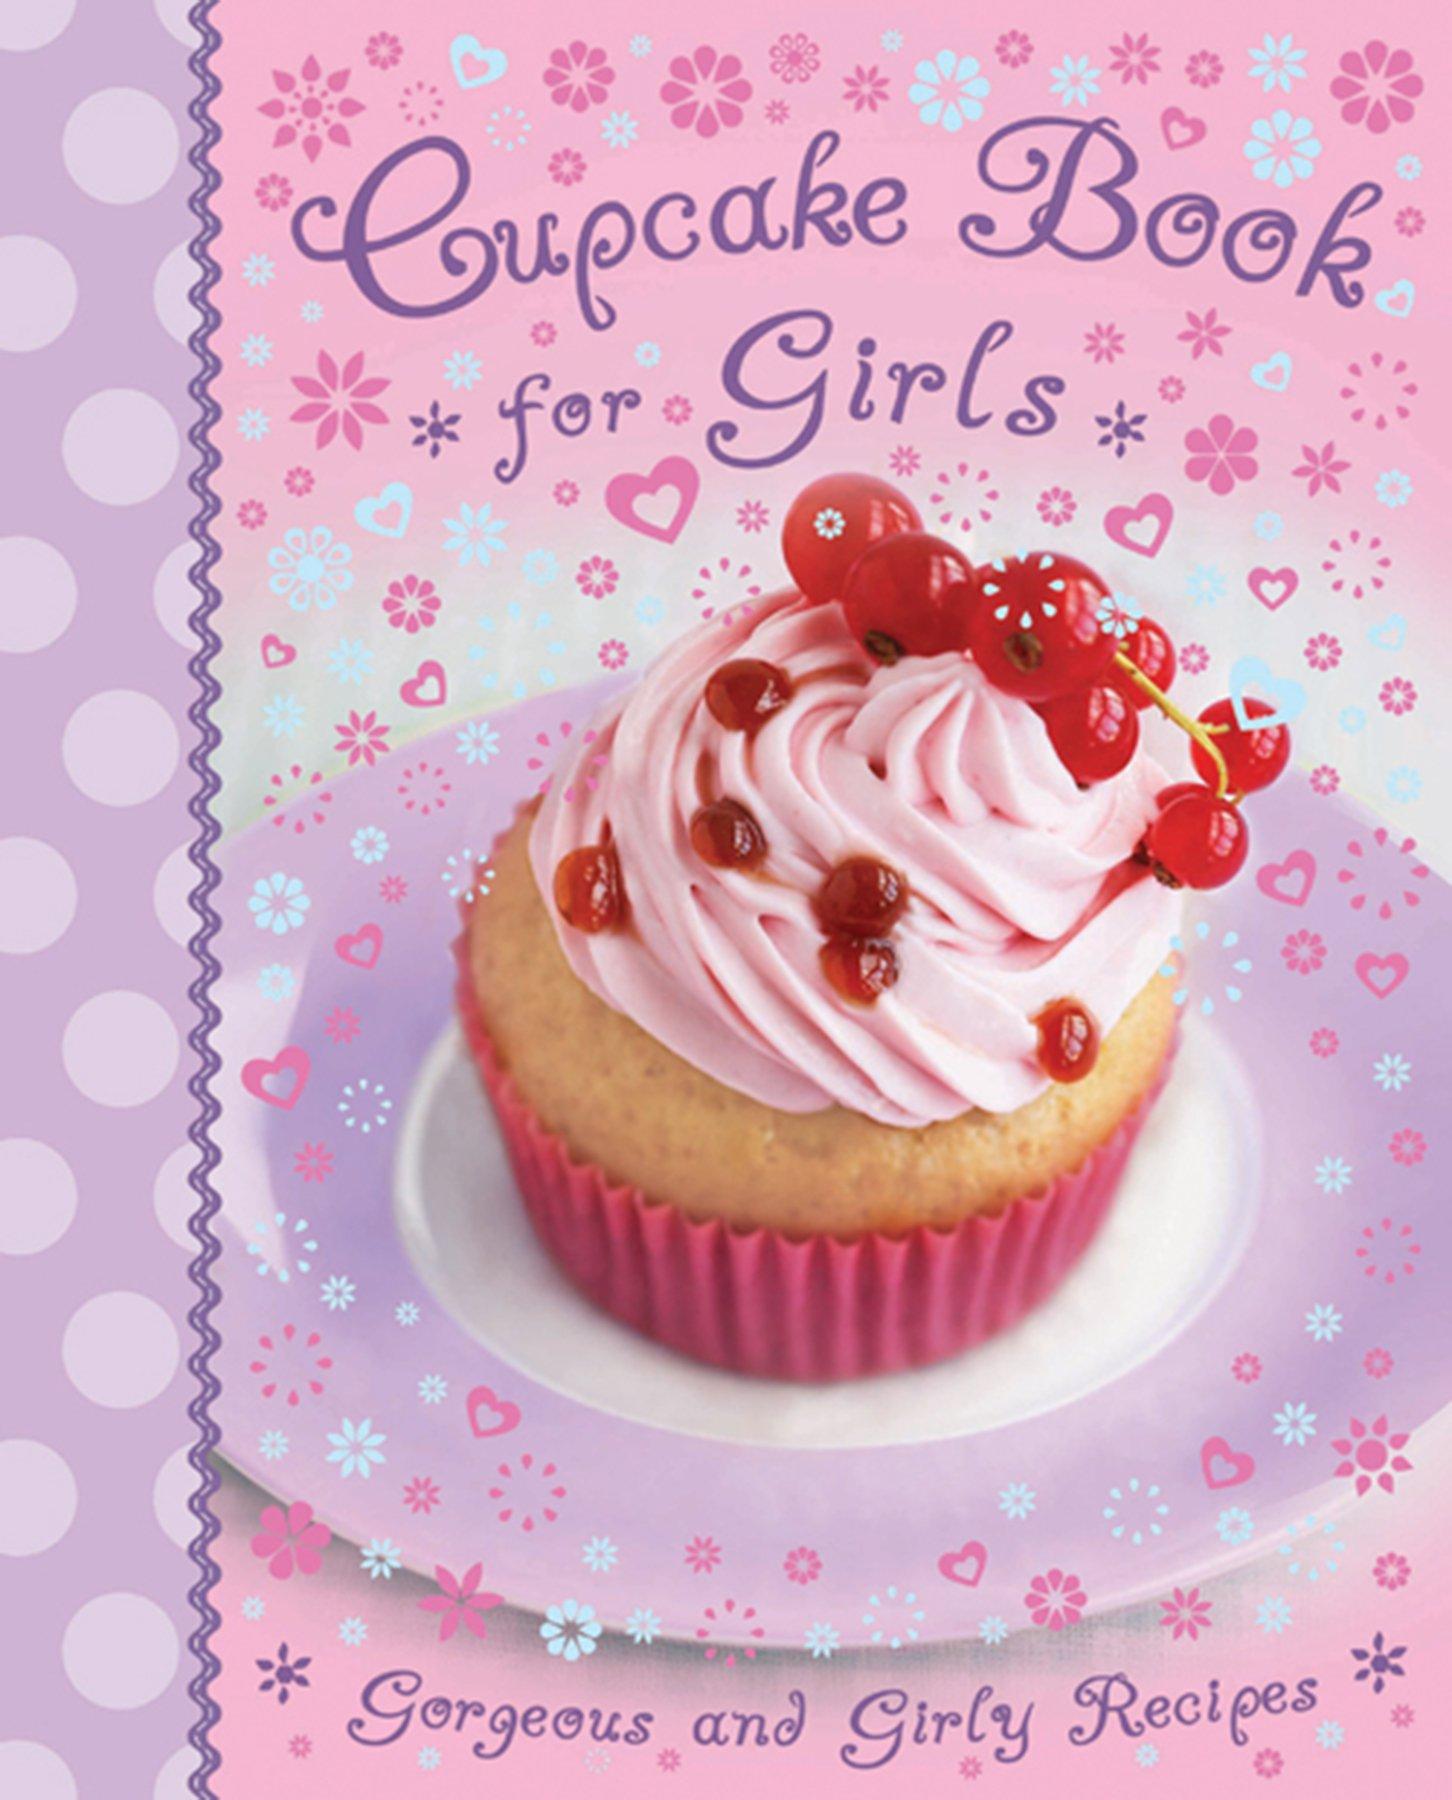 Cupcake Book For Girls Gorgoeus And Girly Recipes Kids Cook Hardcover 1 Jun 2014